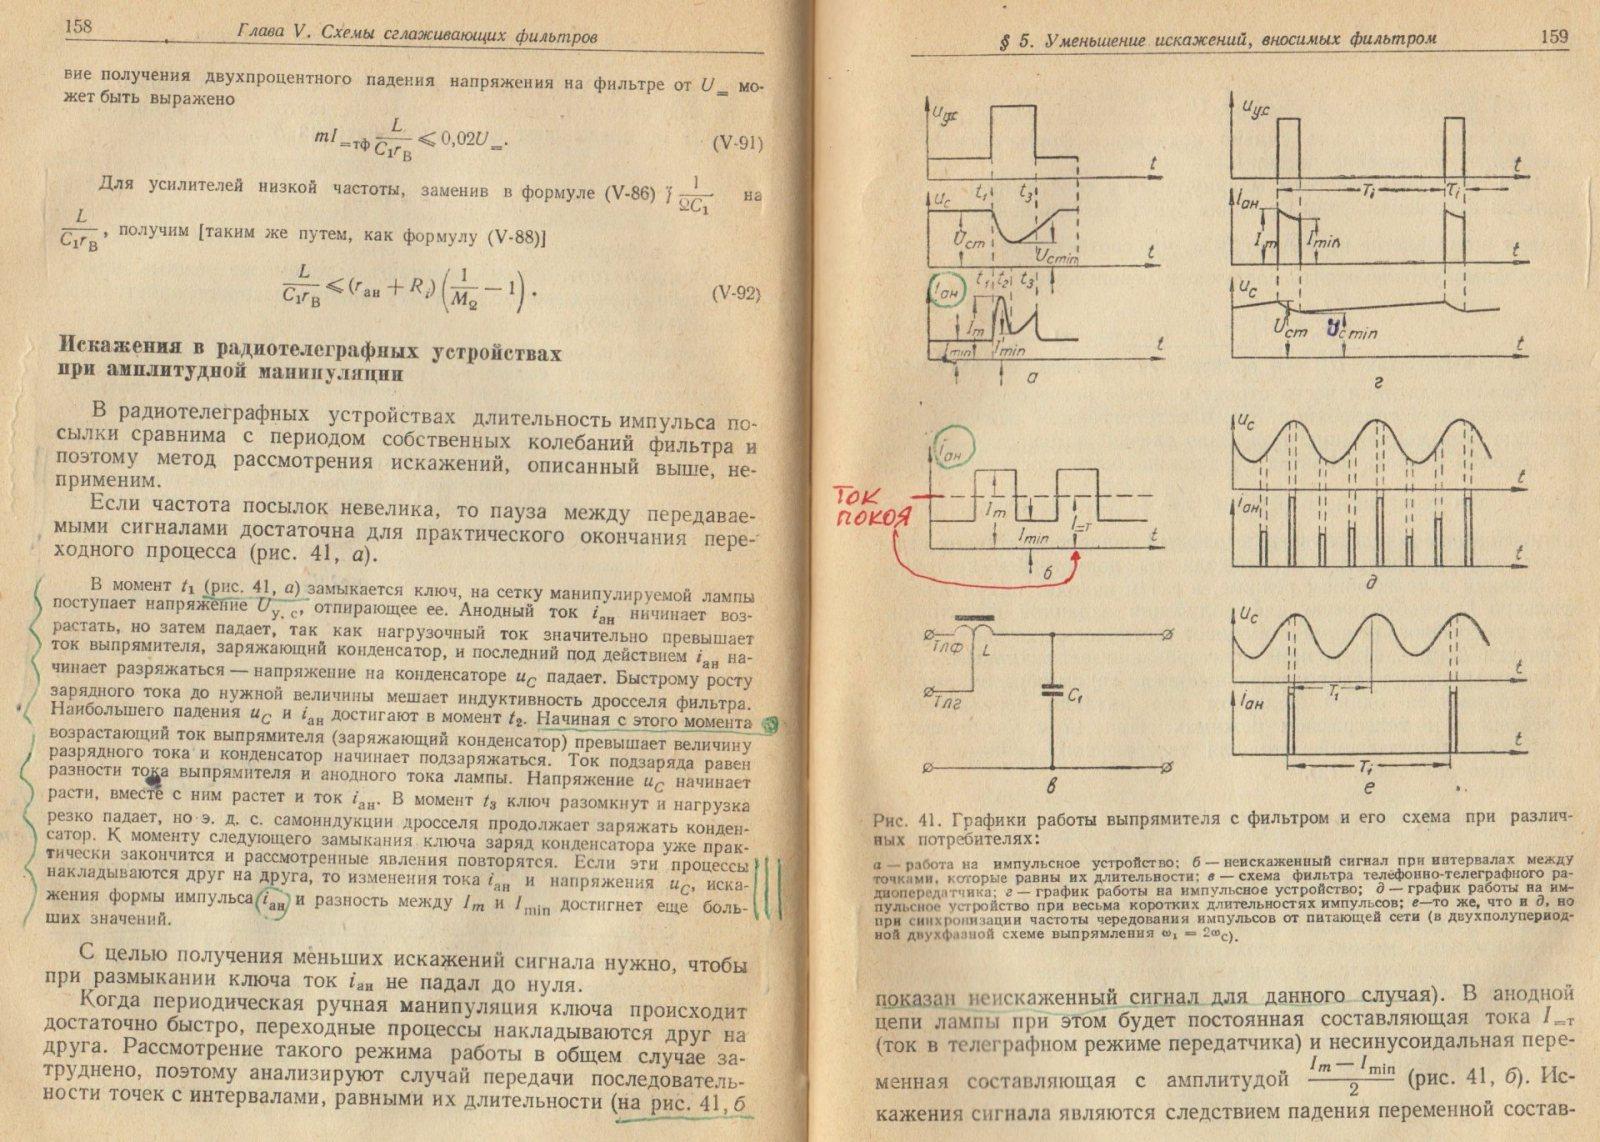 Векслер и Тетельбаум 005.jpg